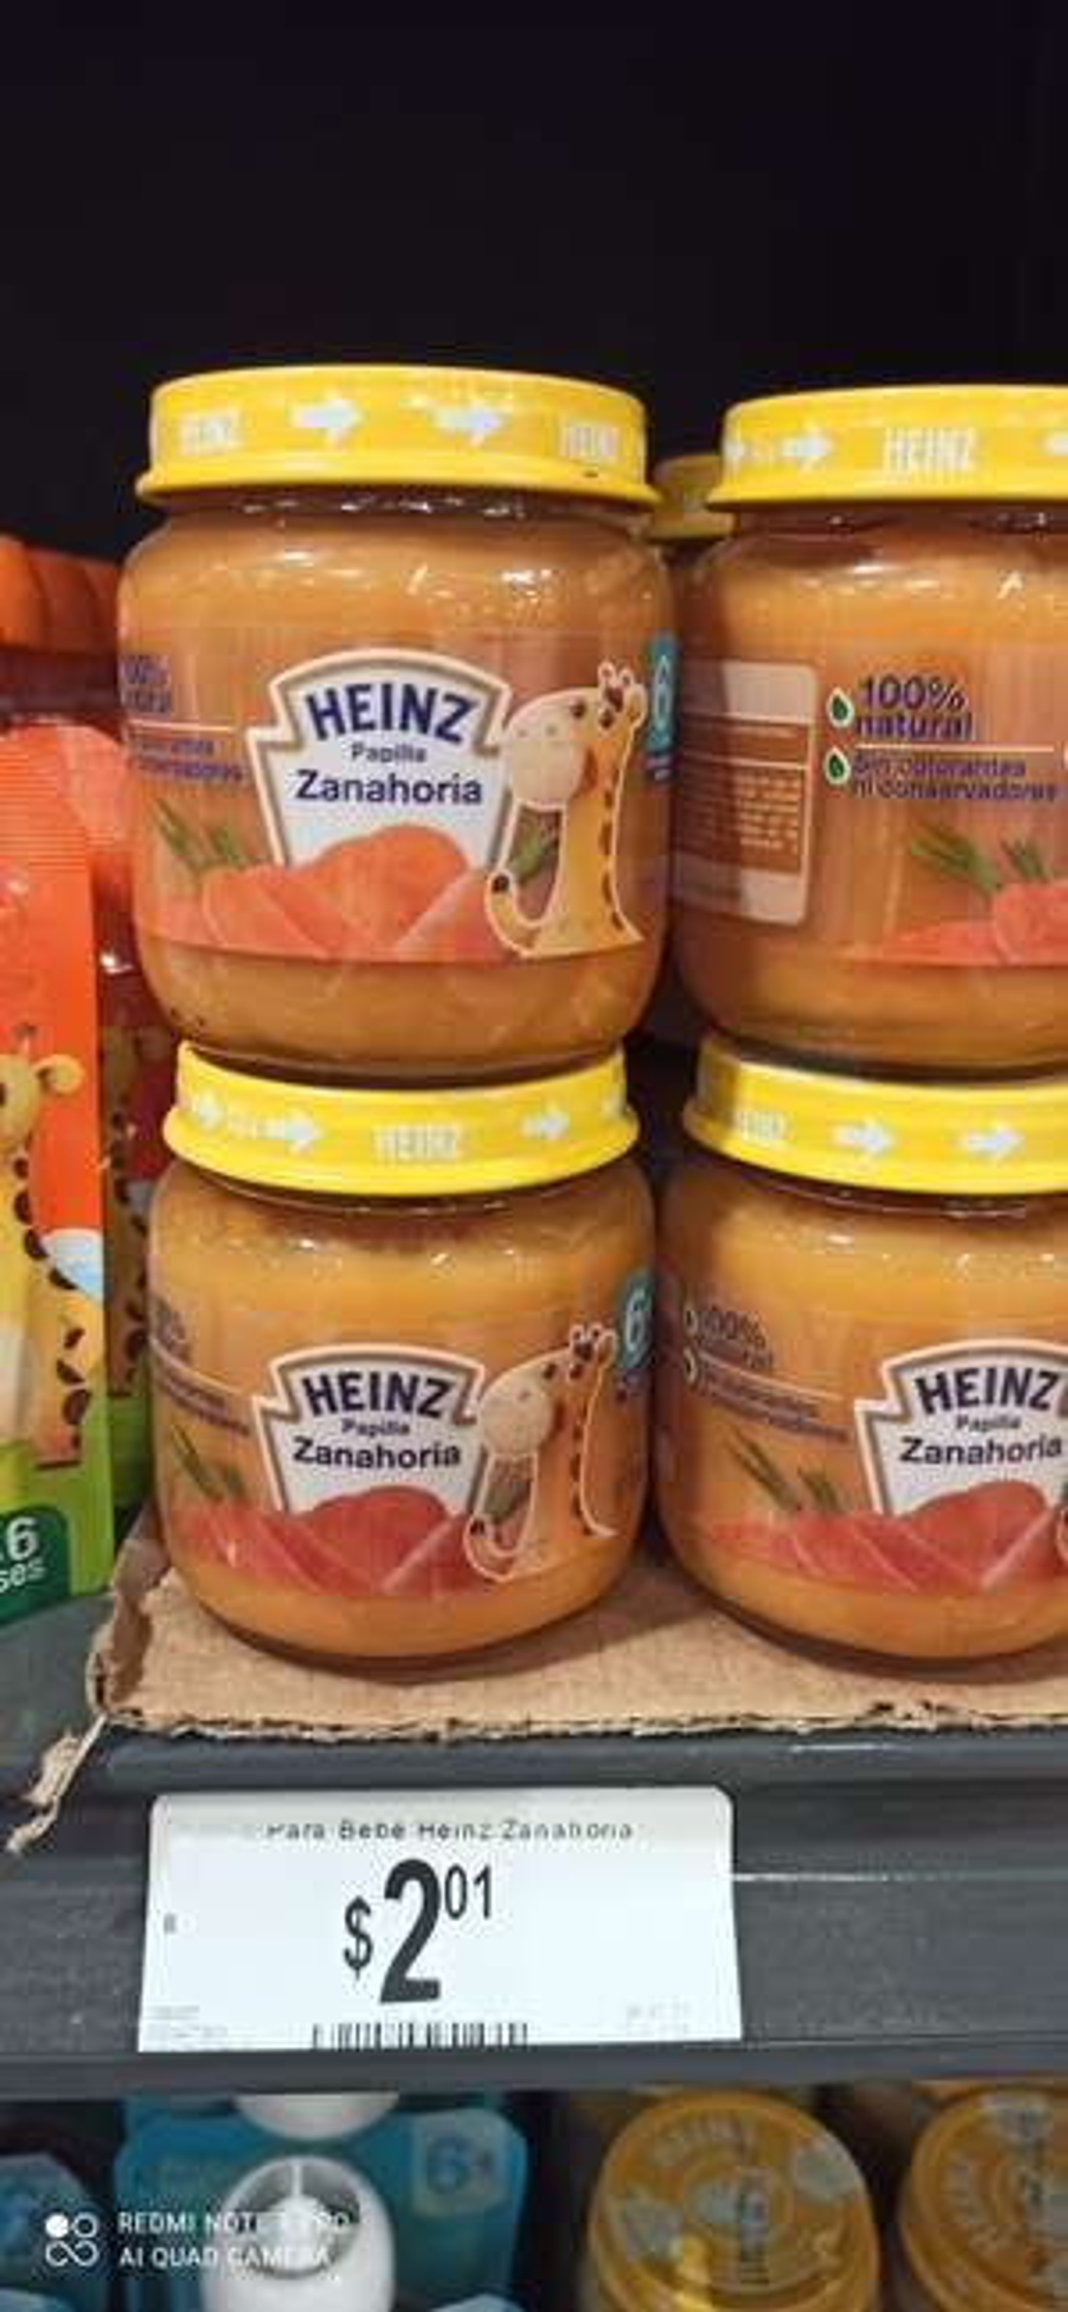 Chedraui: Papilla de zanahoria marca Heinz